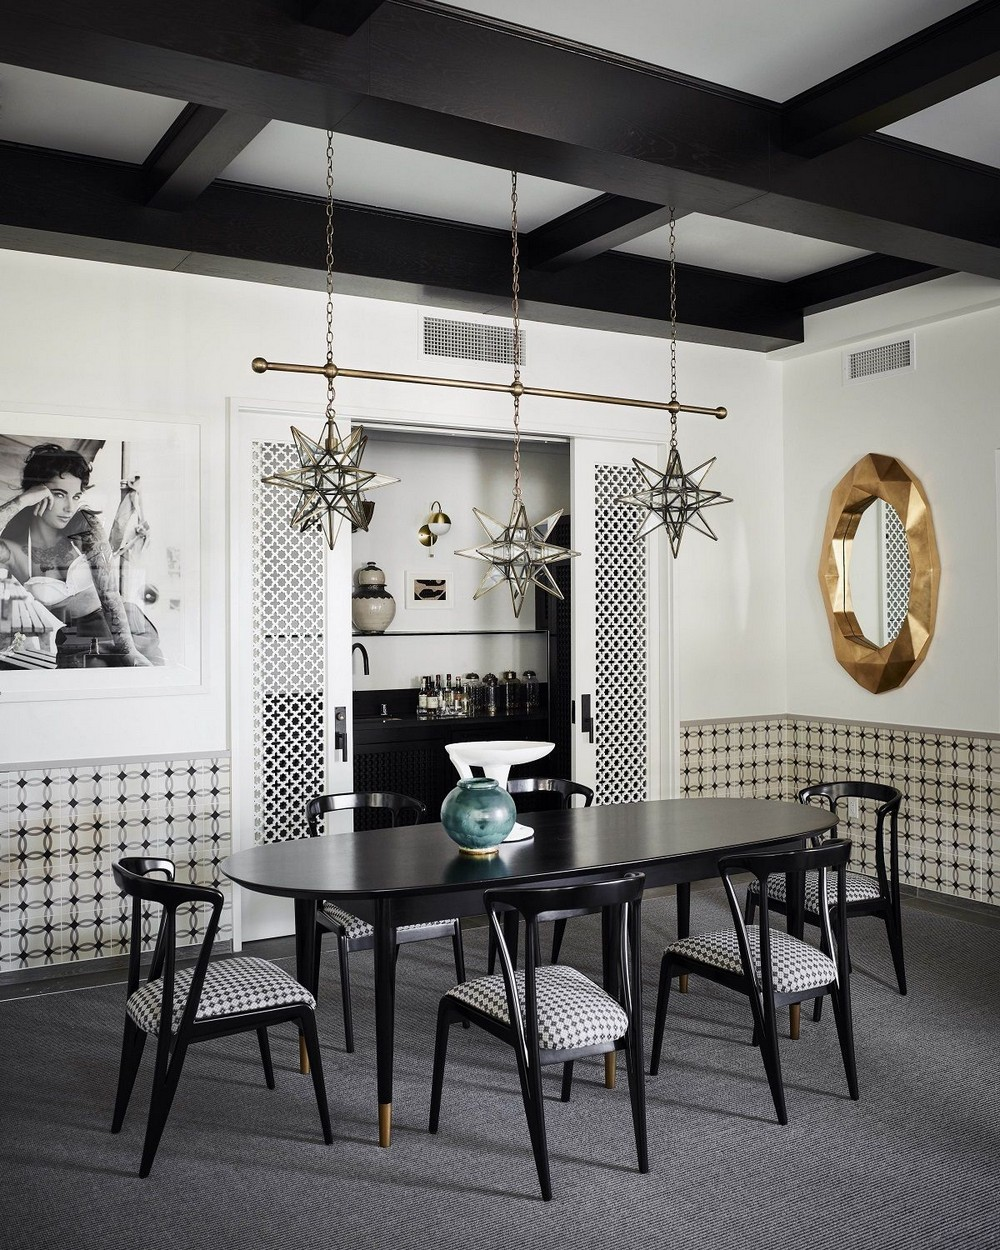 martyn lawrence bullard Dining Room Projects by Martyn Lawrence Bullard 4 Pinterest 1